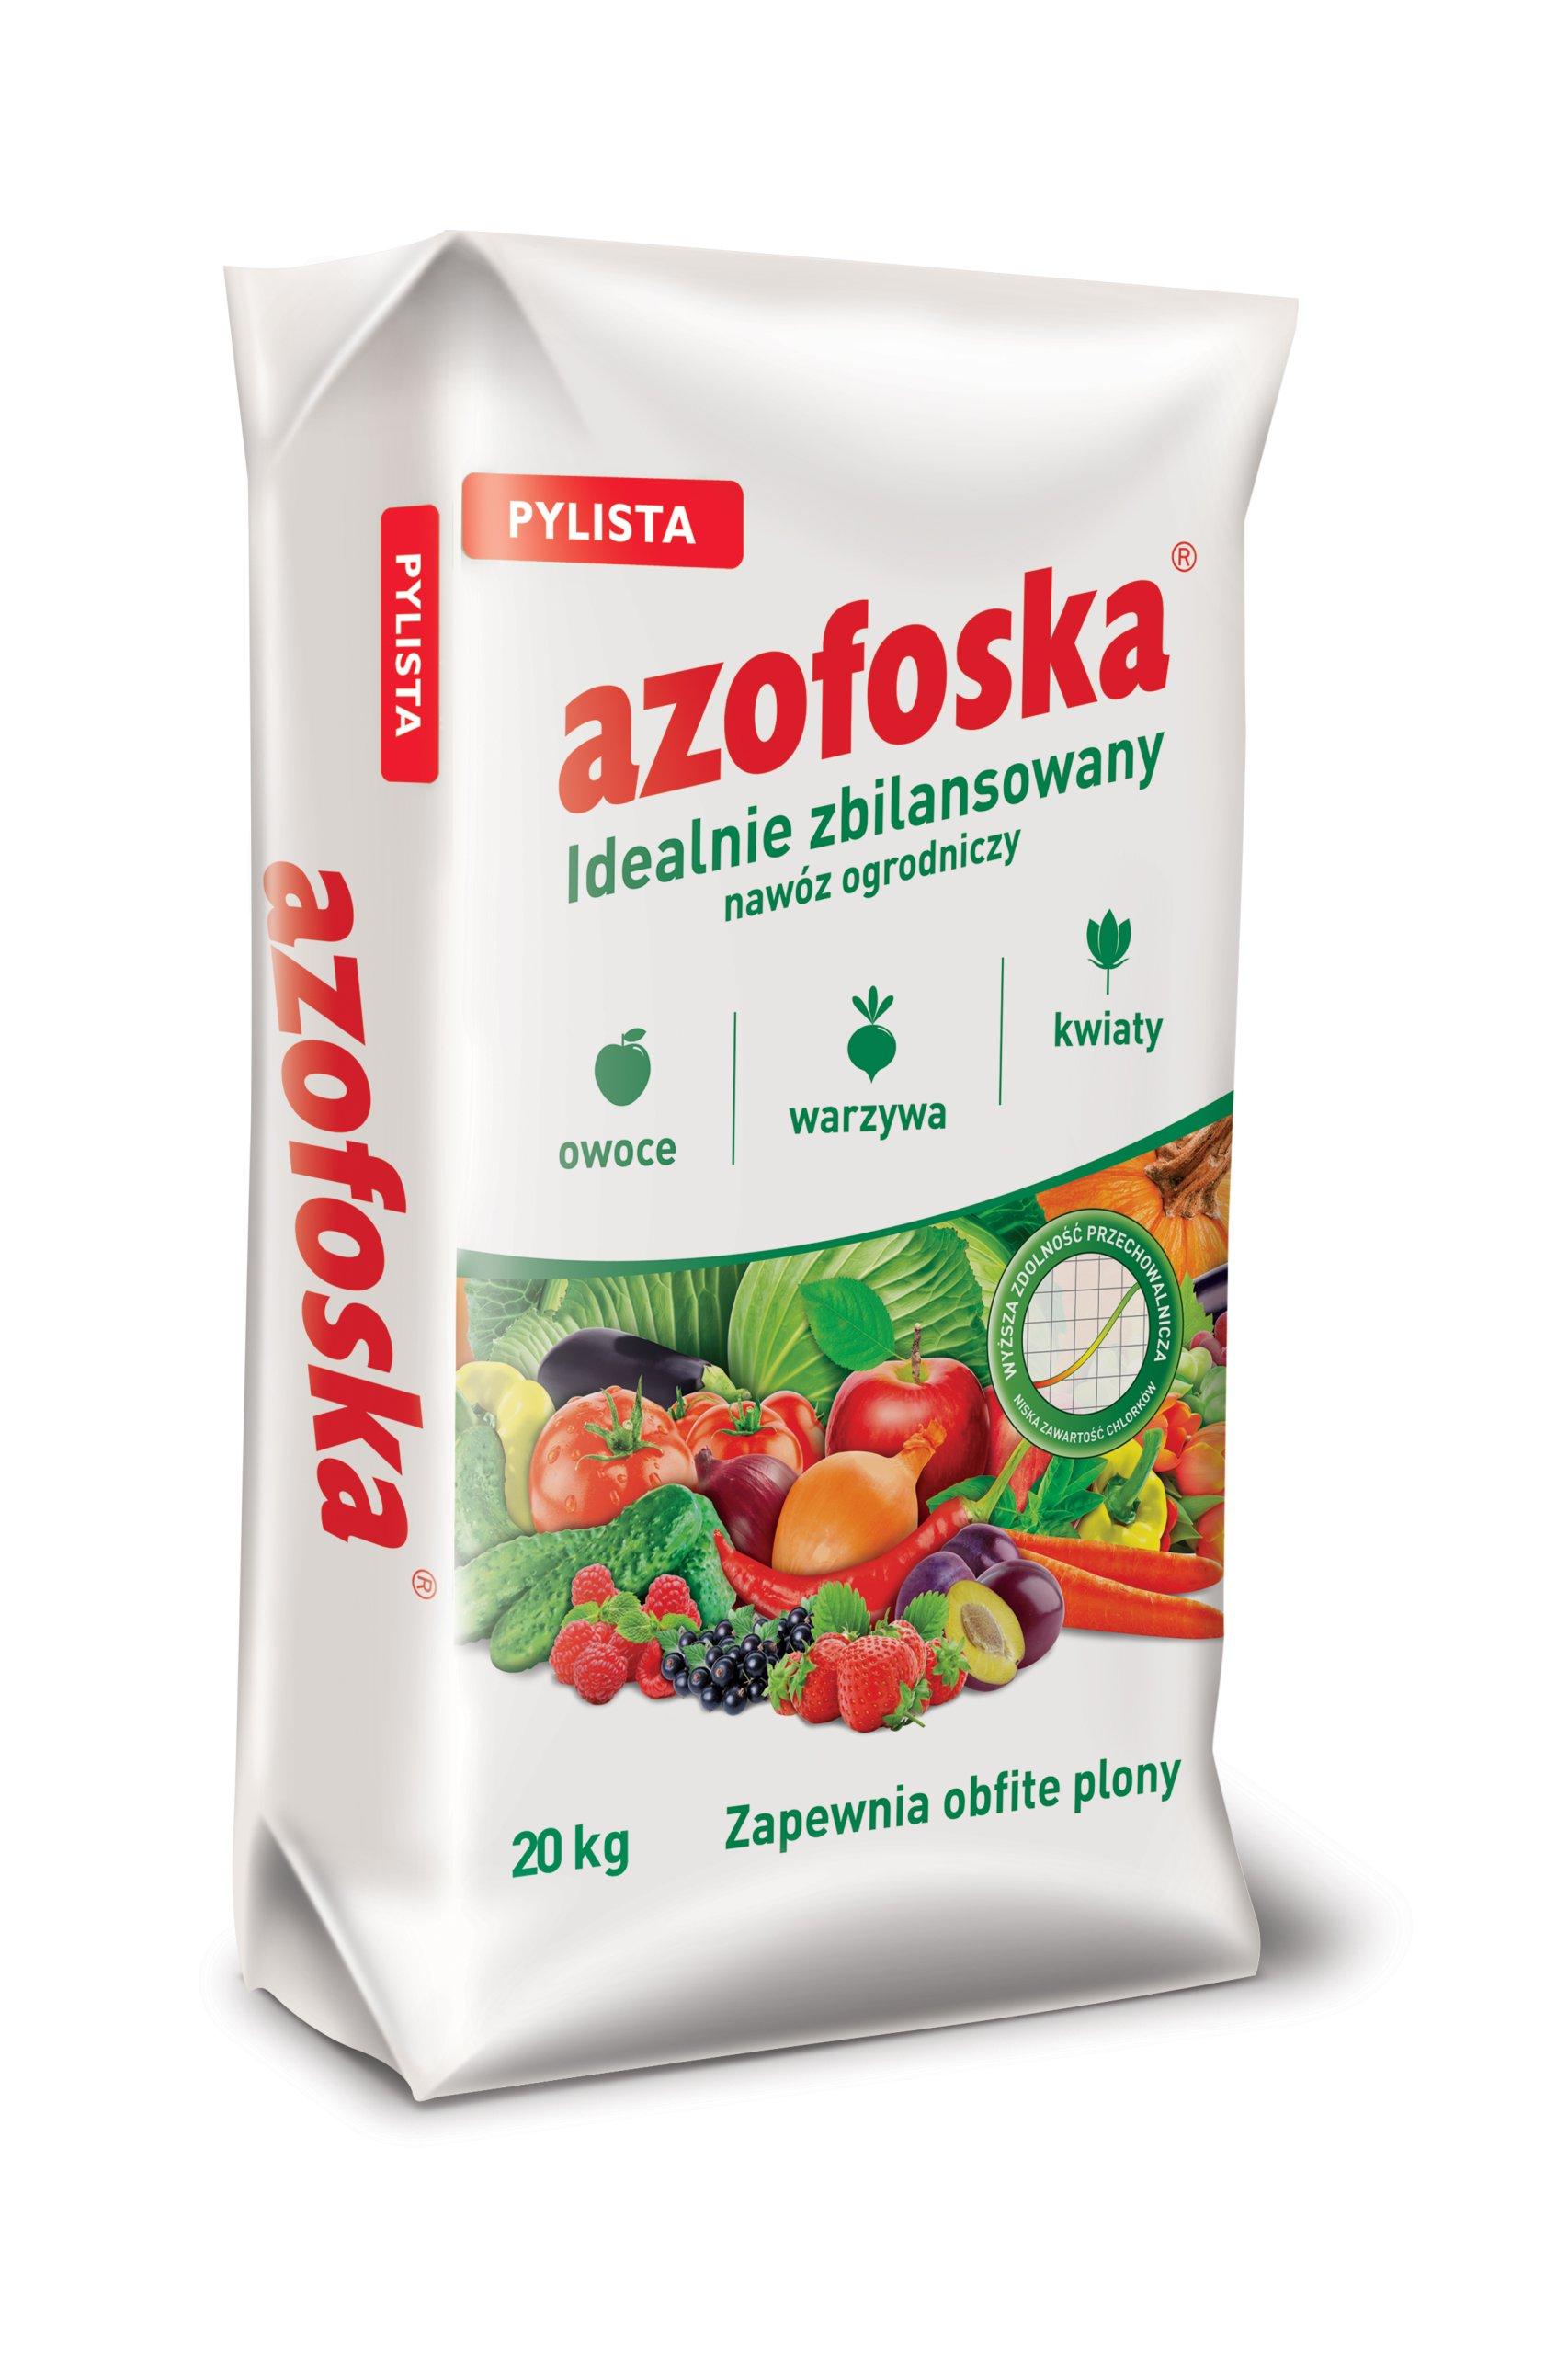 PYLISTA 20kg AZOFOSKA hnojív, KOSAČKY, Apple sadu, BOROVICA NPK